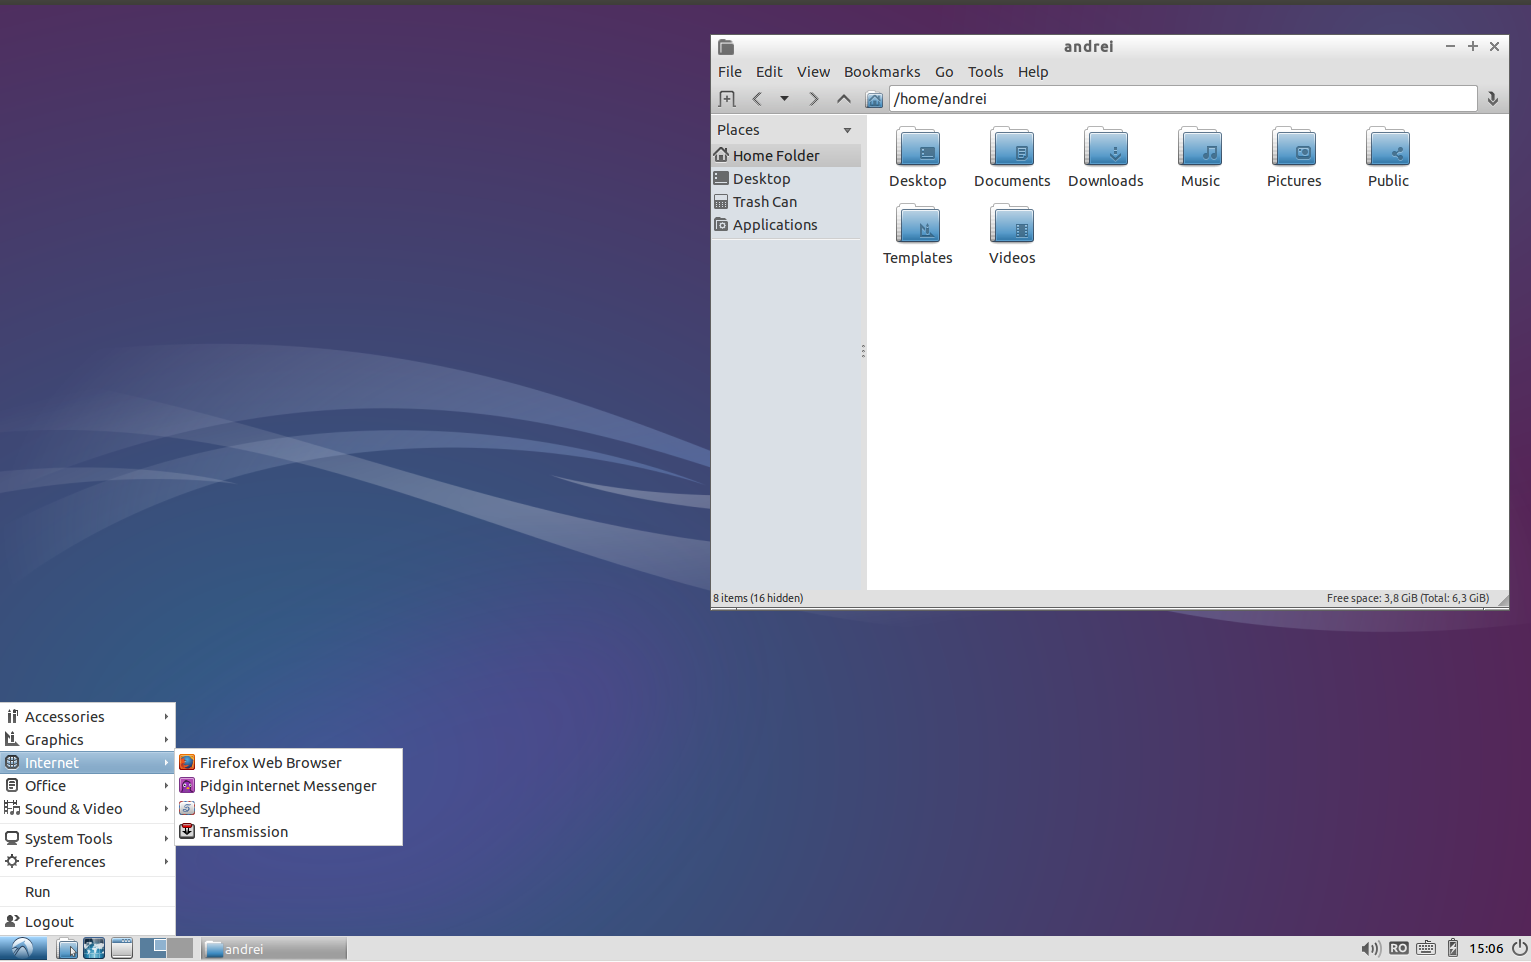 Lubuntu 14.04 LTS desktop